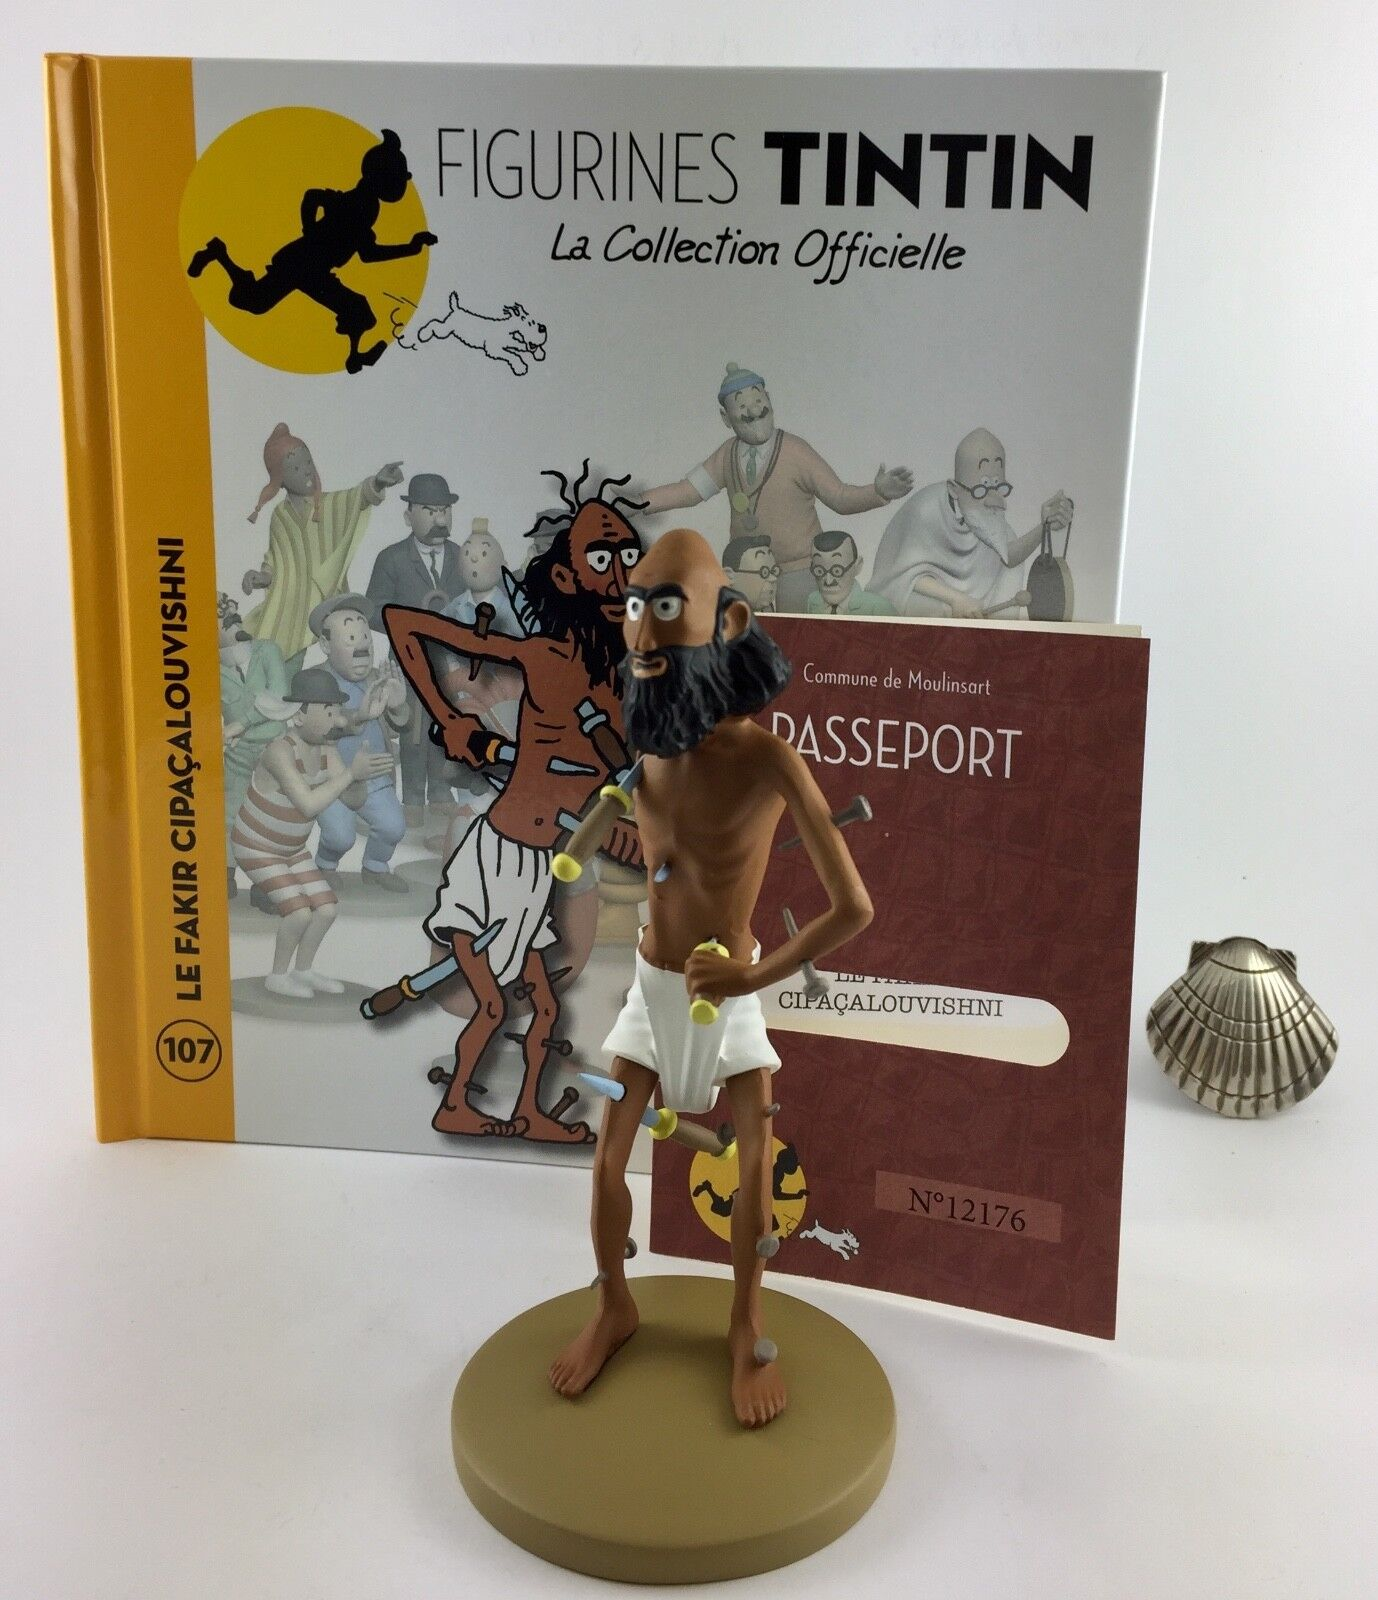 Collection officielle figurine Tintin Moulinsart 107 Fakir Cipaçalouvishni